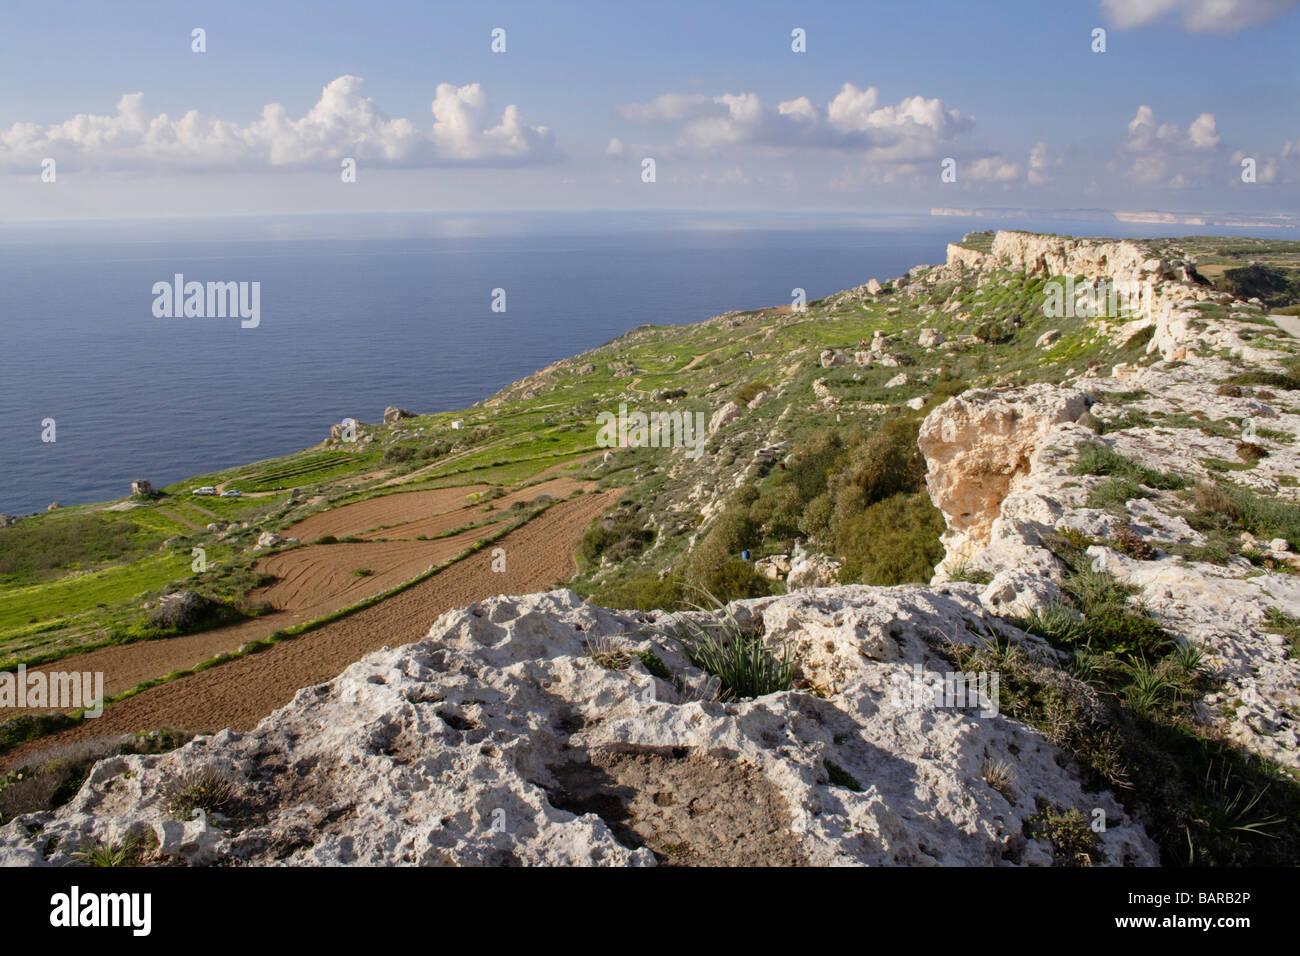 Limestone ridge on the north-west coast of Malta, a Mediterranean island - Stock Image